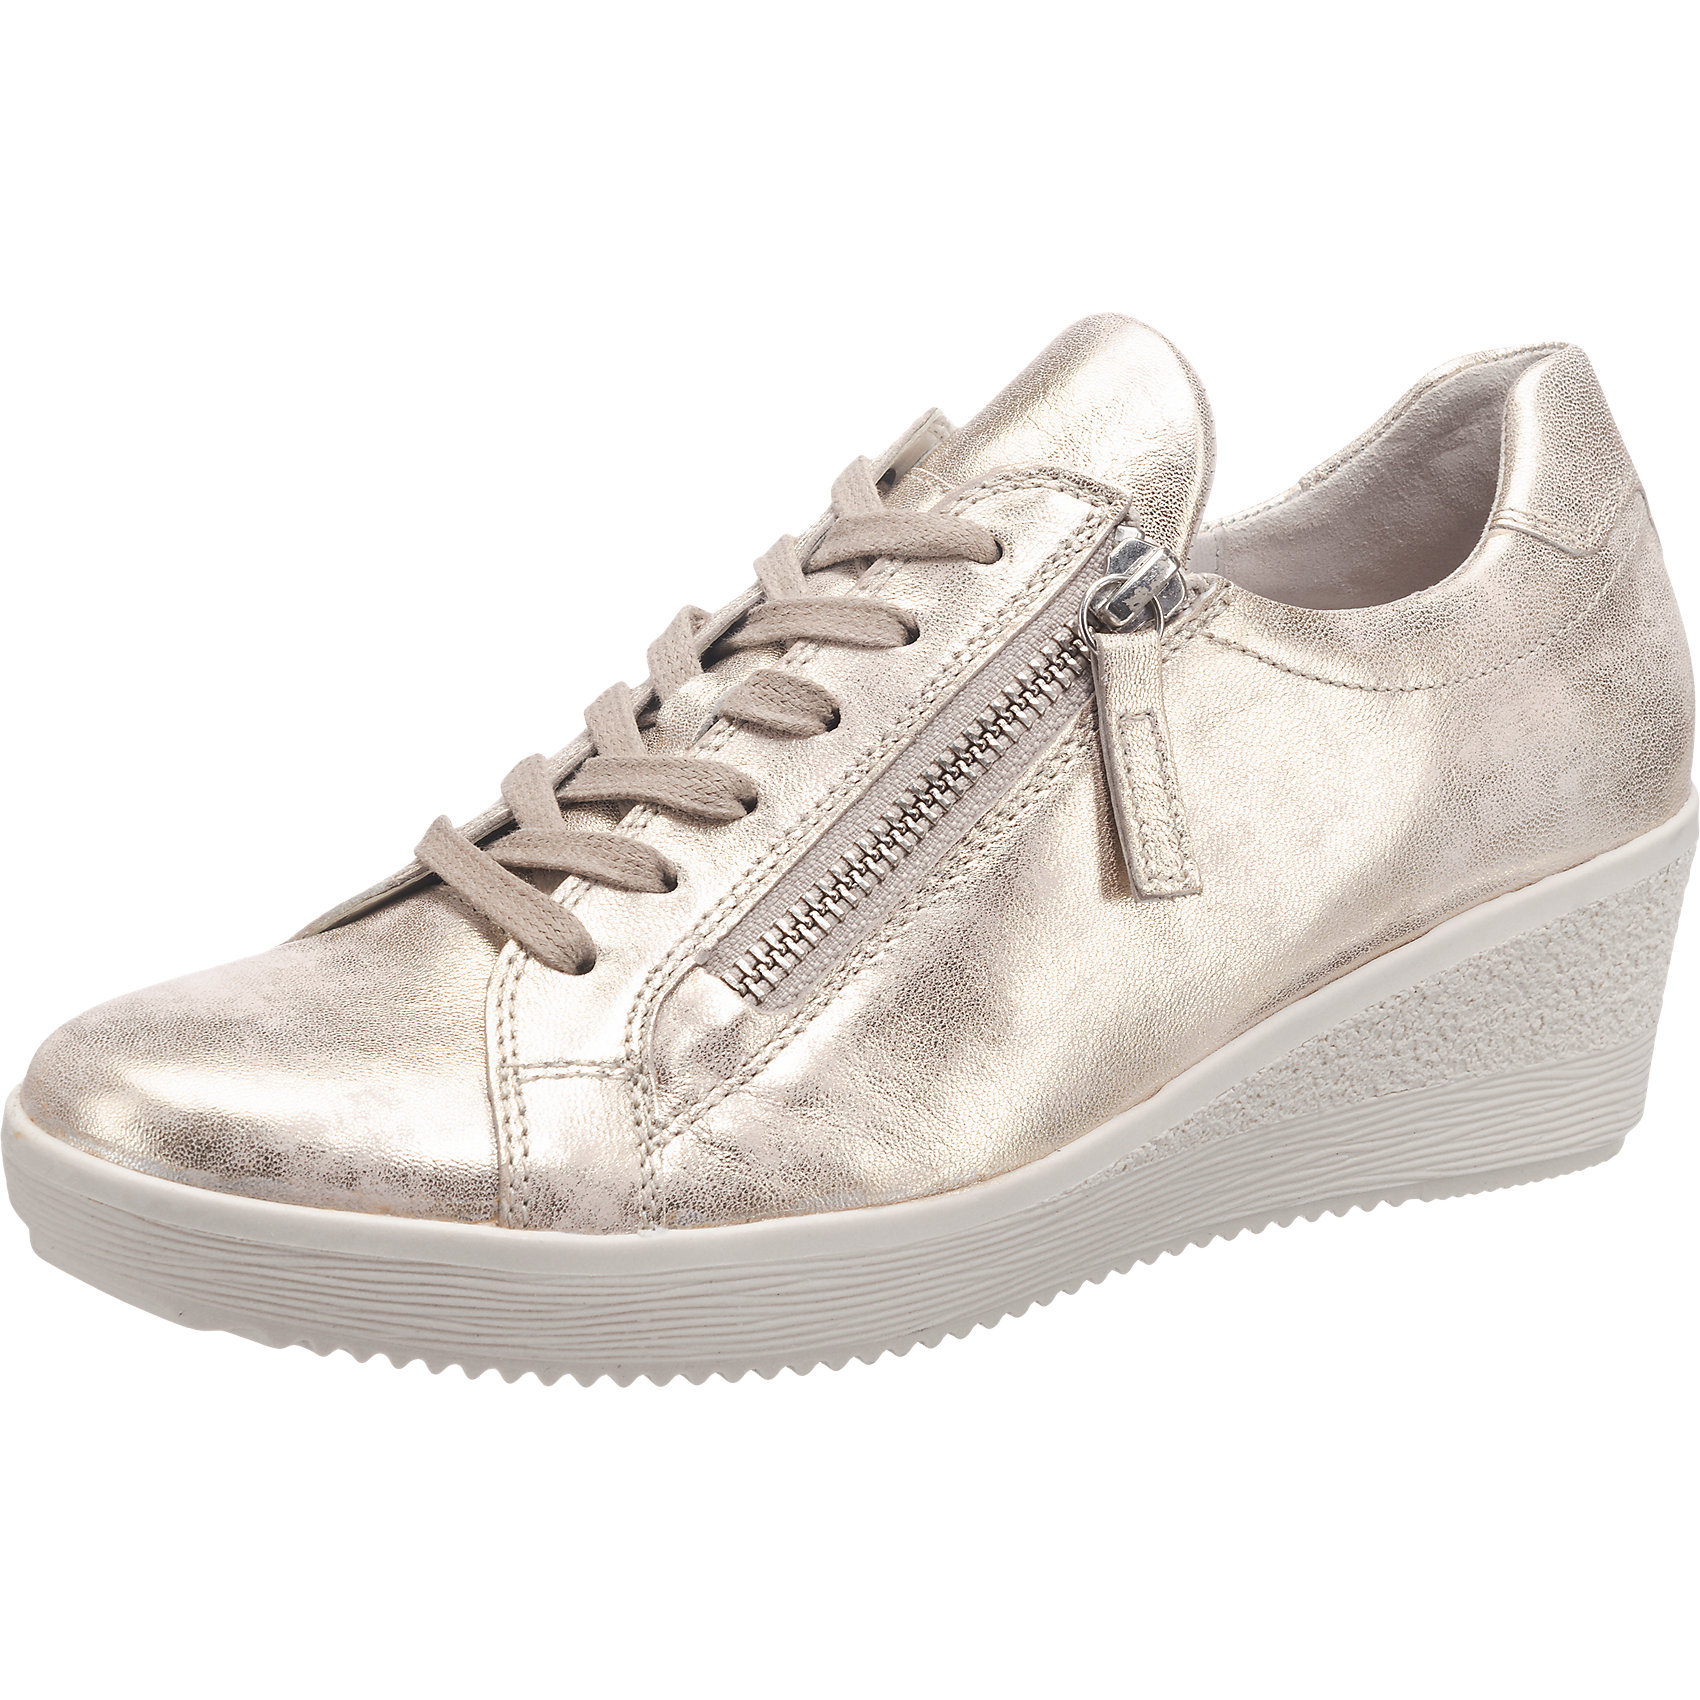 Details zu Neu Gabor Sneakers grau 5769091